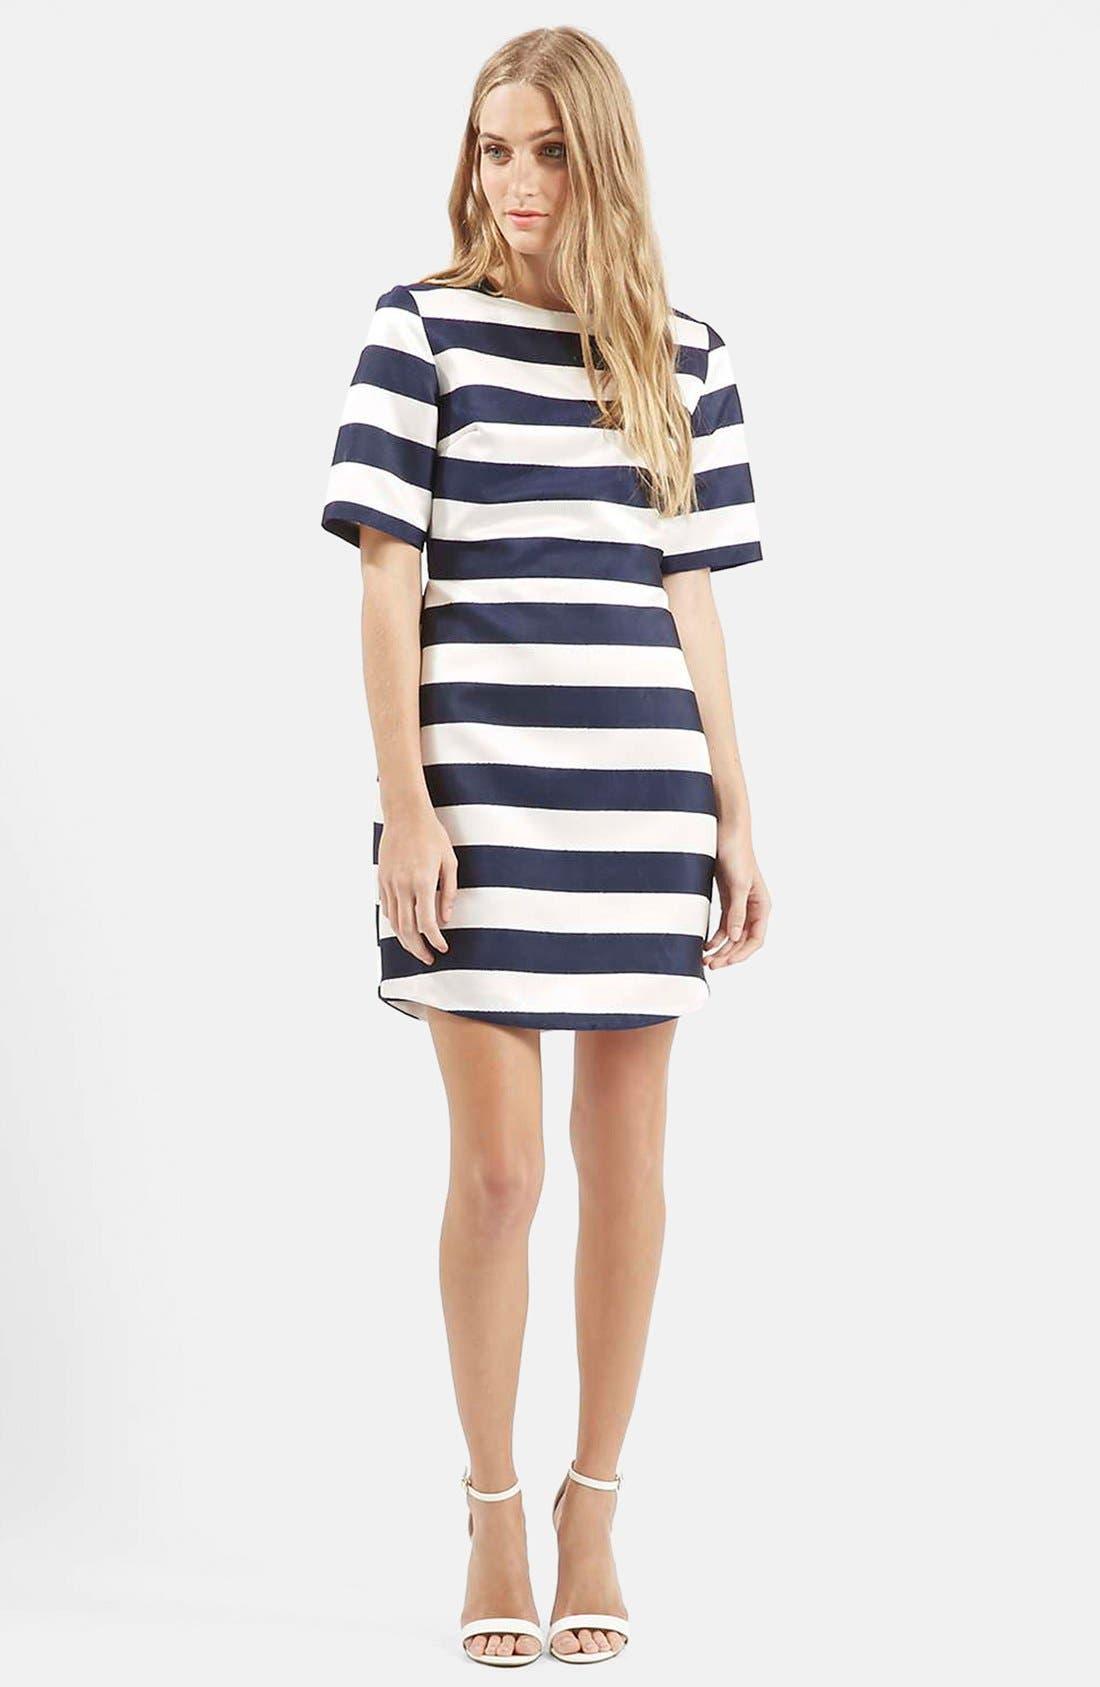 TOPSHOP, Twill & Satin Stripe Dress, Main thumbnail 1, color, 410